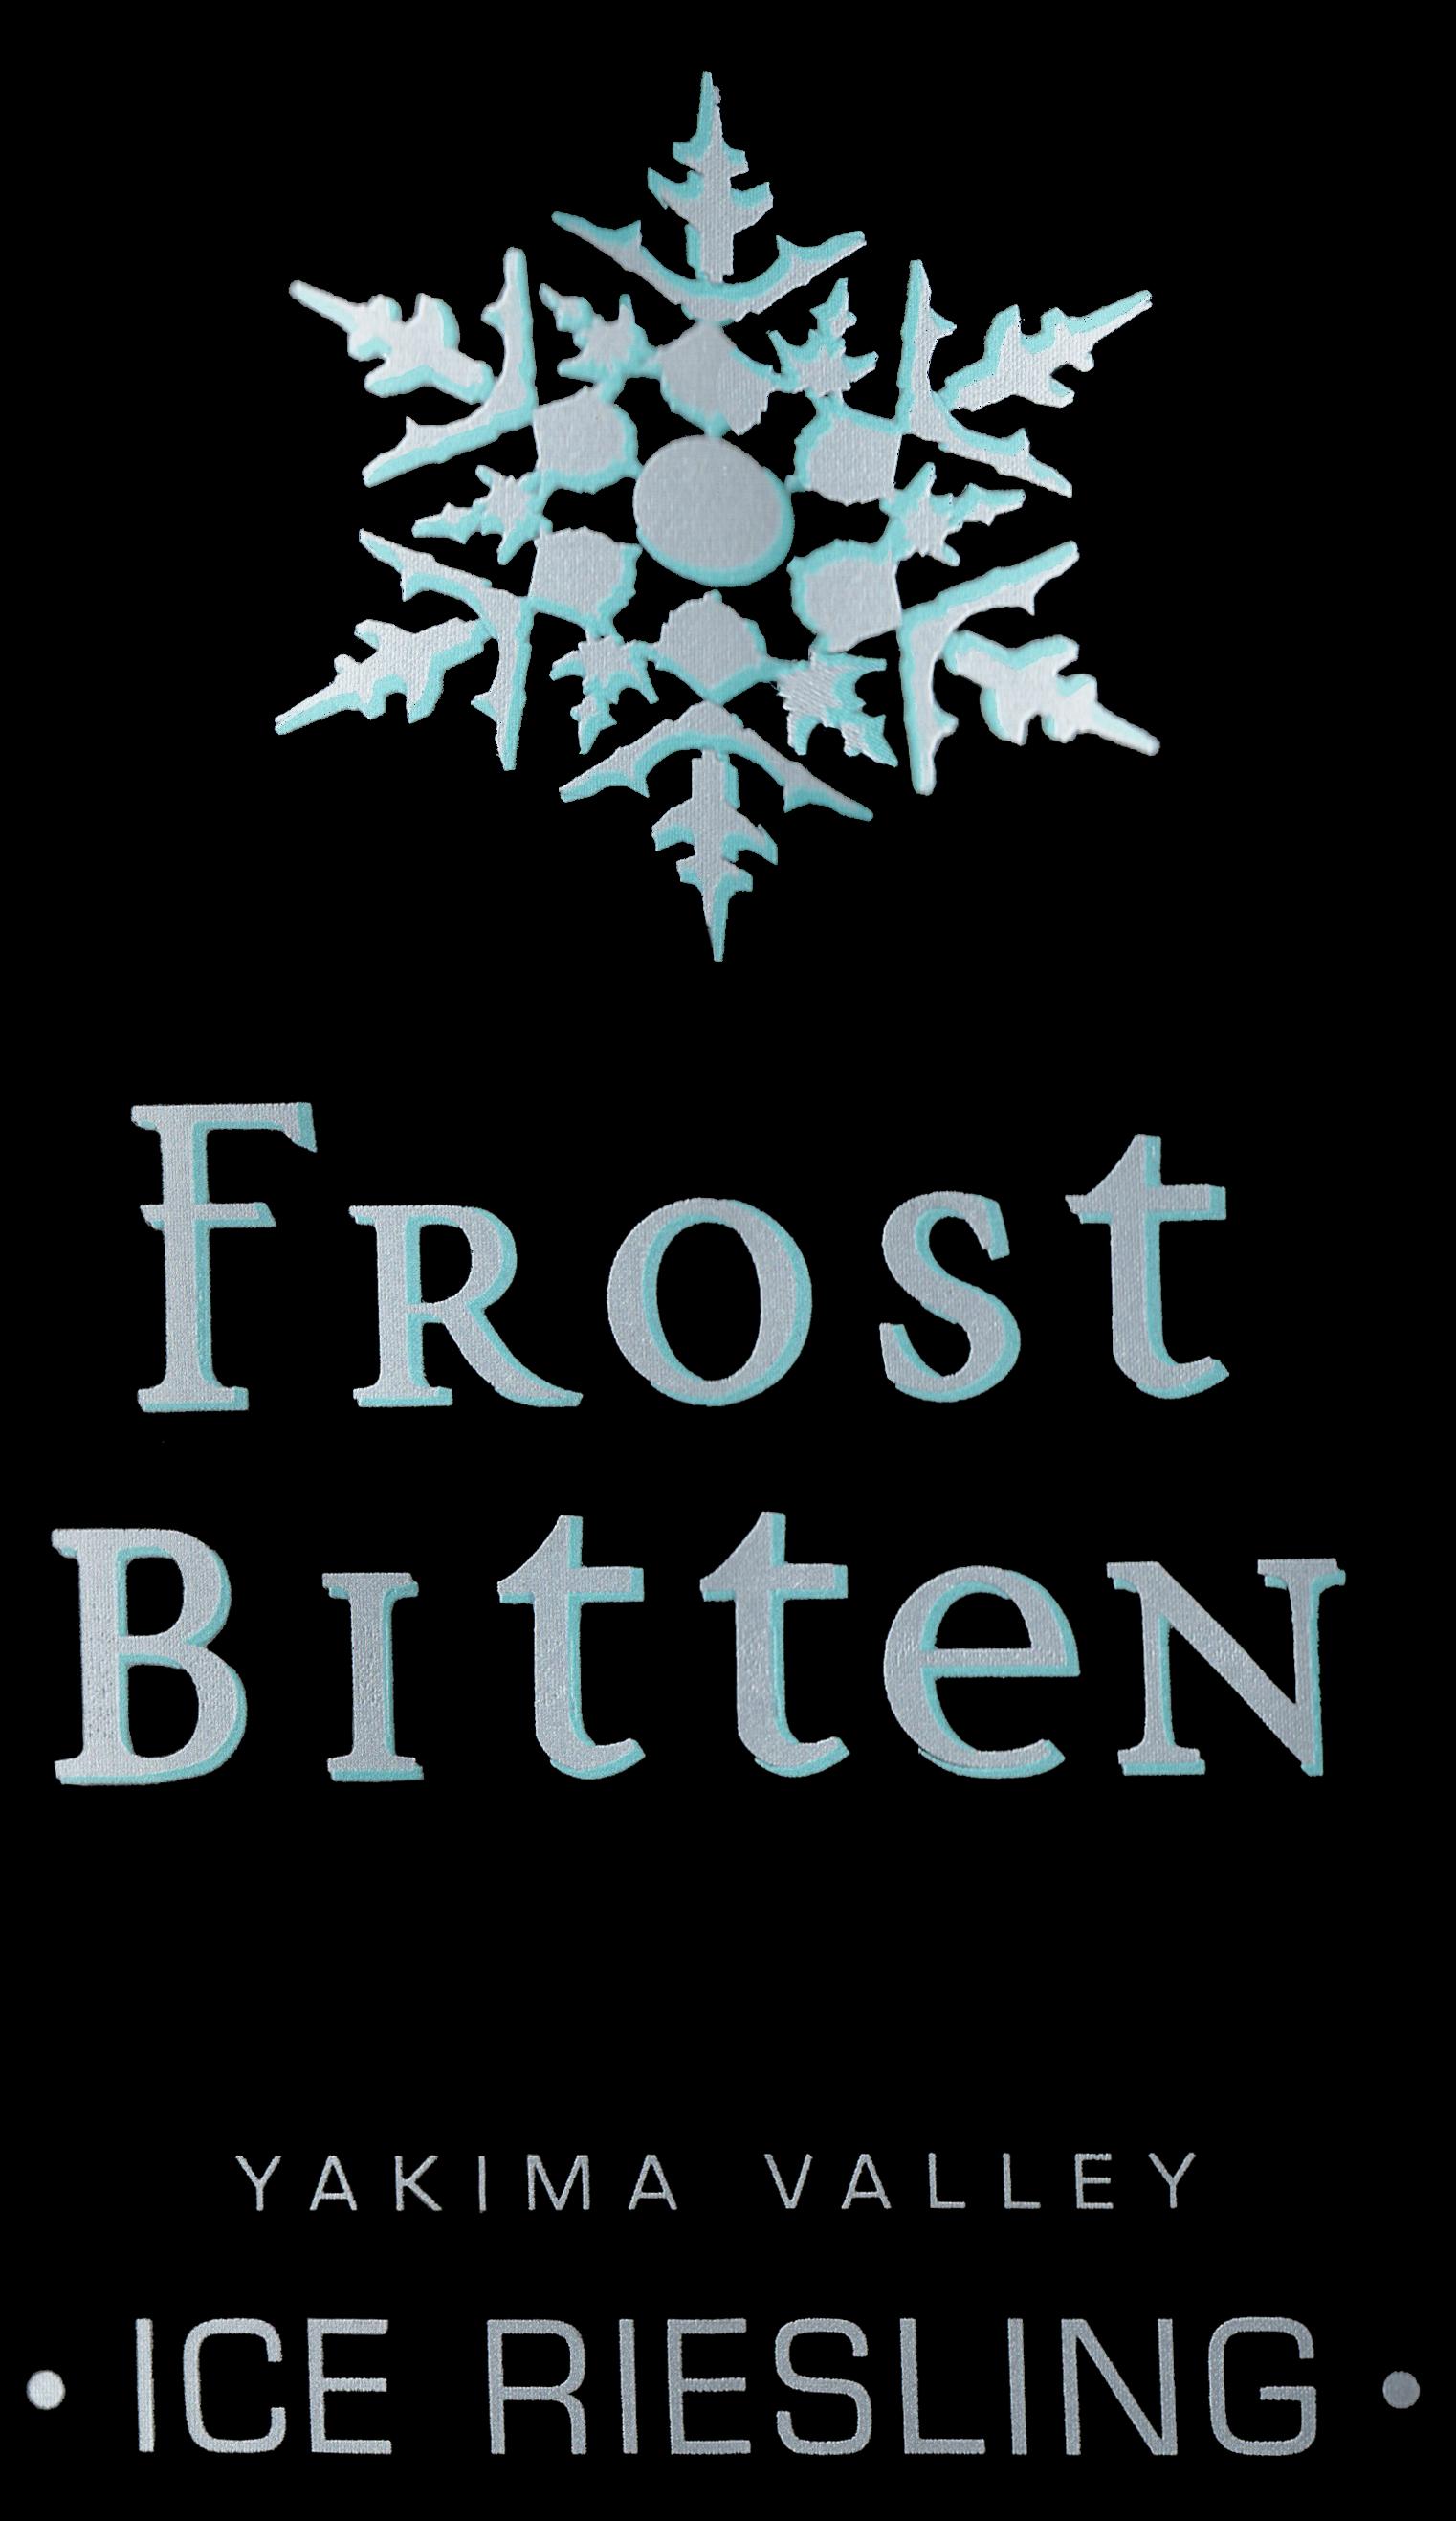 Frost Bitten Ice Riesling Yakima Valley 2019